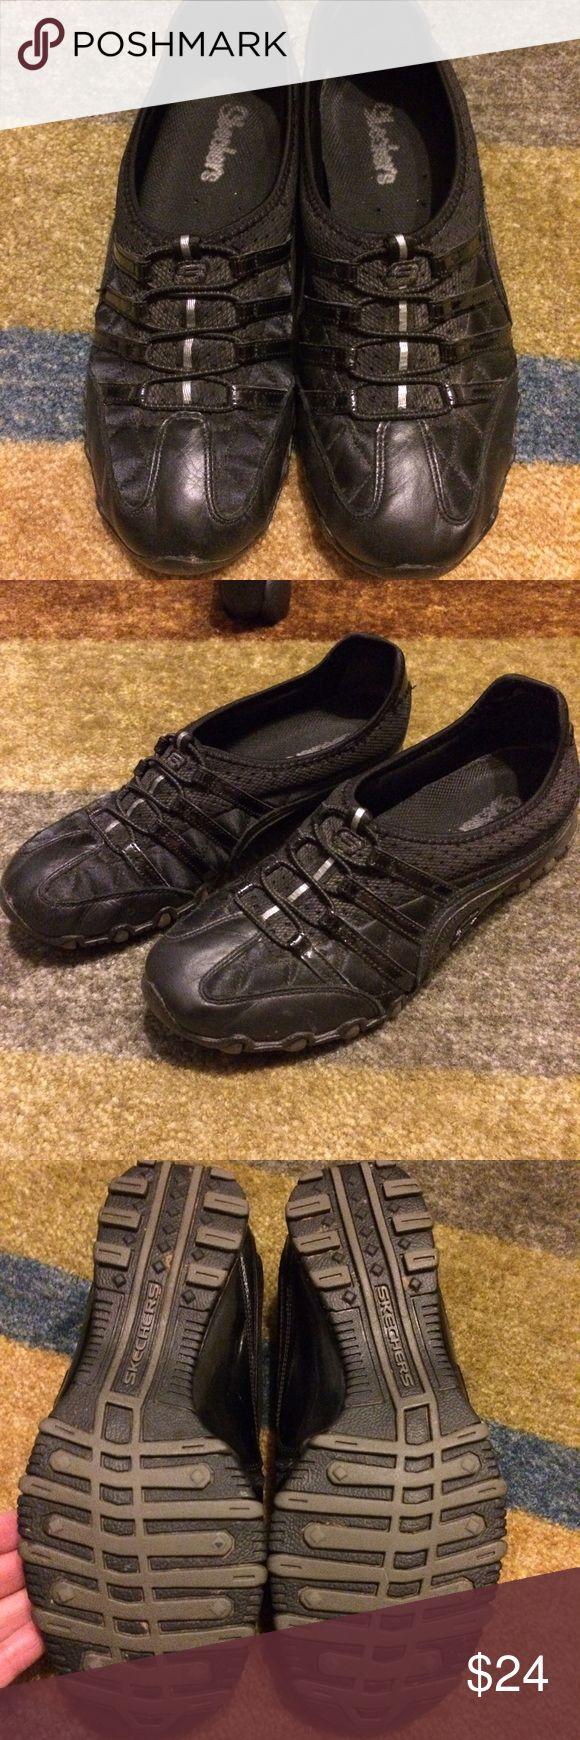 👟Women's Skechers Slip on Sneakers 👟 Black Slip on Skechers Sneakers 👟. Size 7. In great condition. Stored in shoe box. Worn a few times and still look great! Skechers Shoes Athletic Shoes